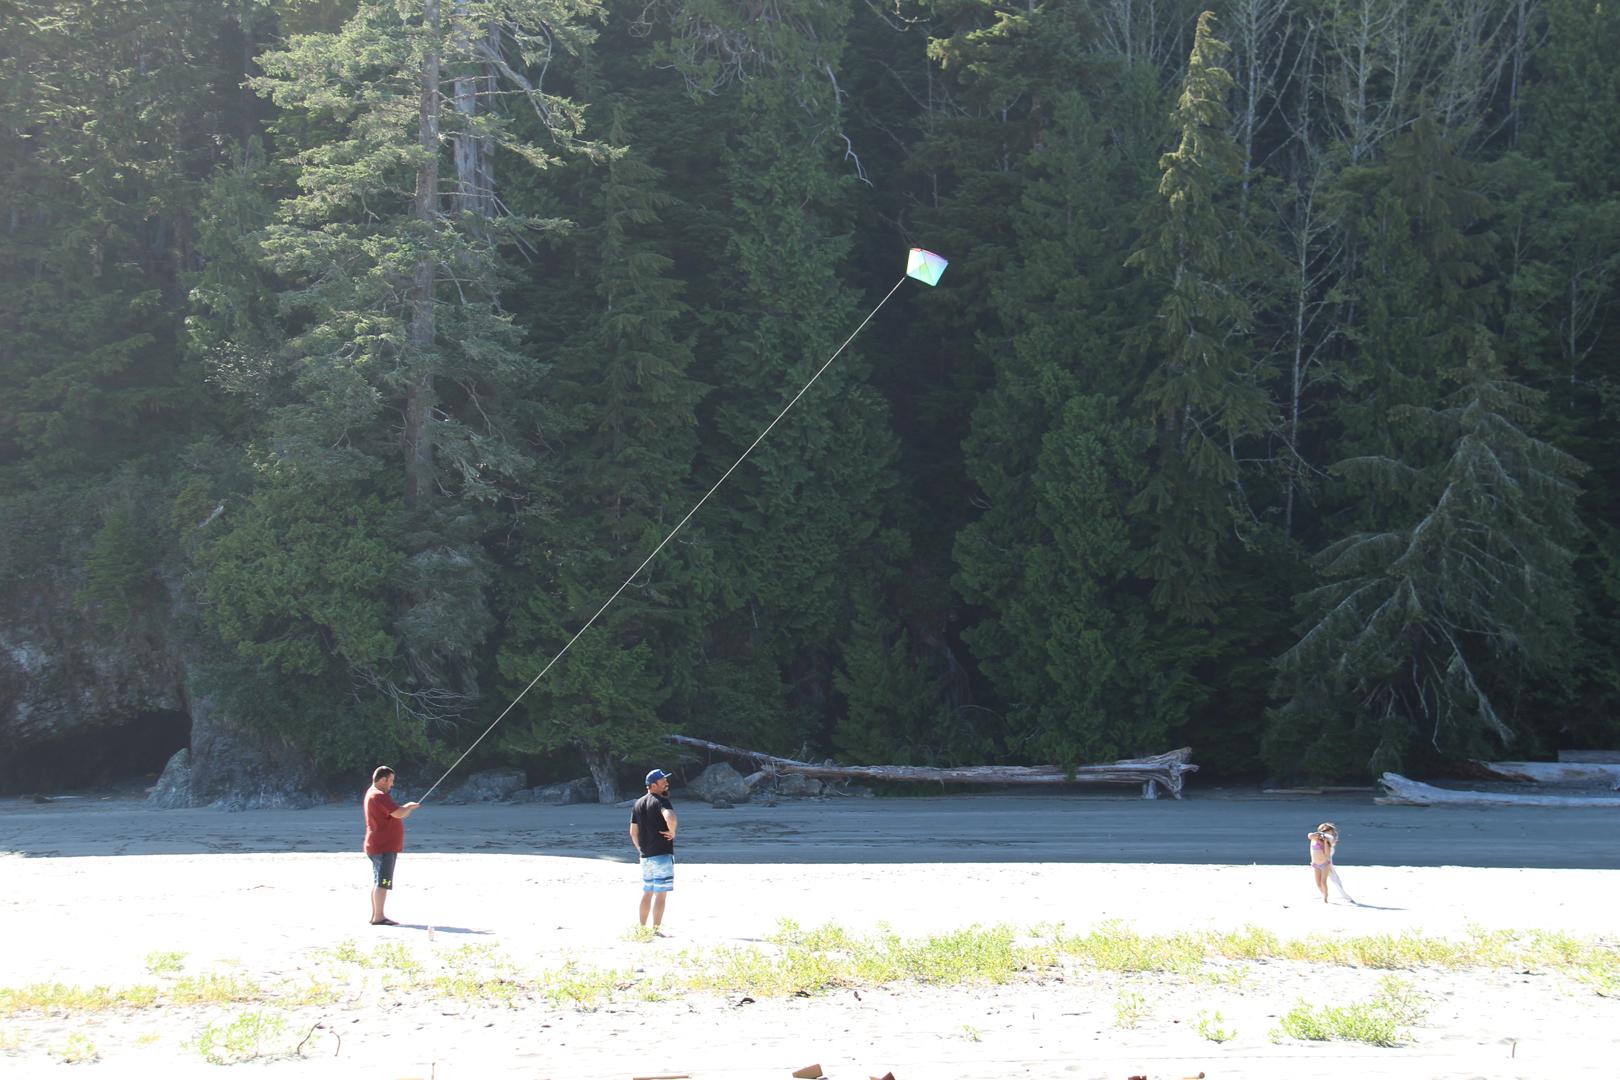 flying a kite on the beach